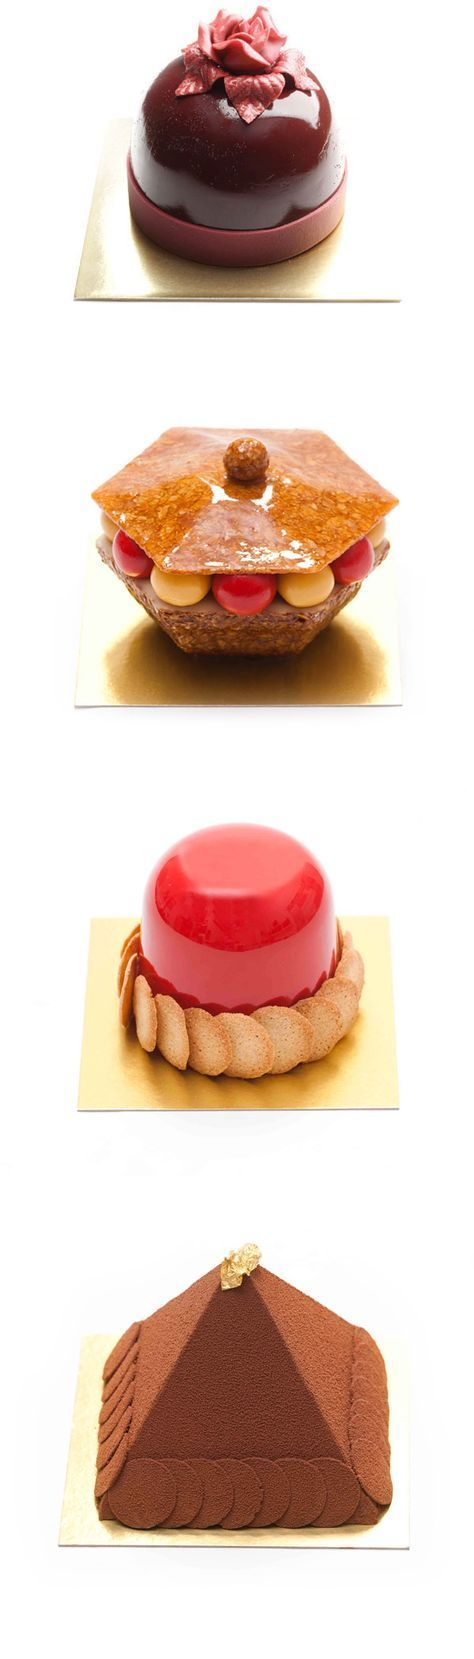 Huize van Wely's - M | Fancy desserts, Mini desserts ...